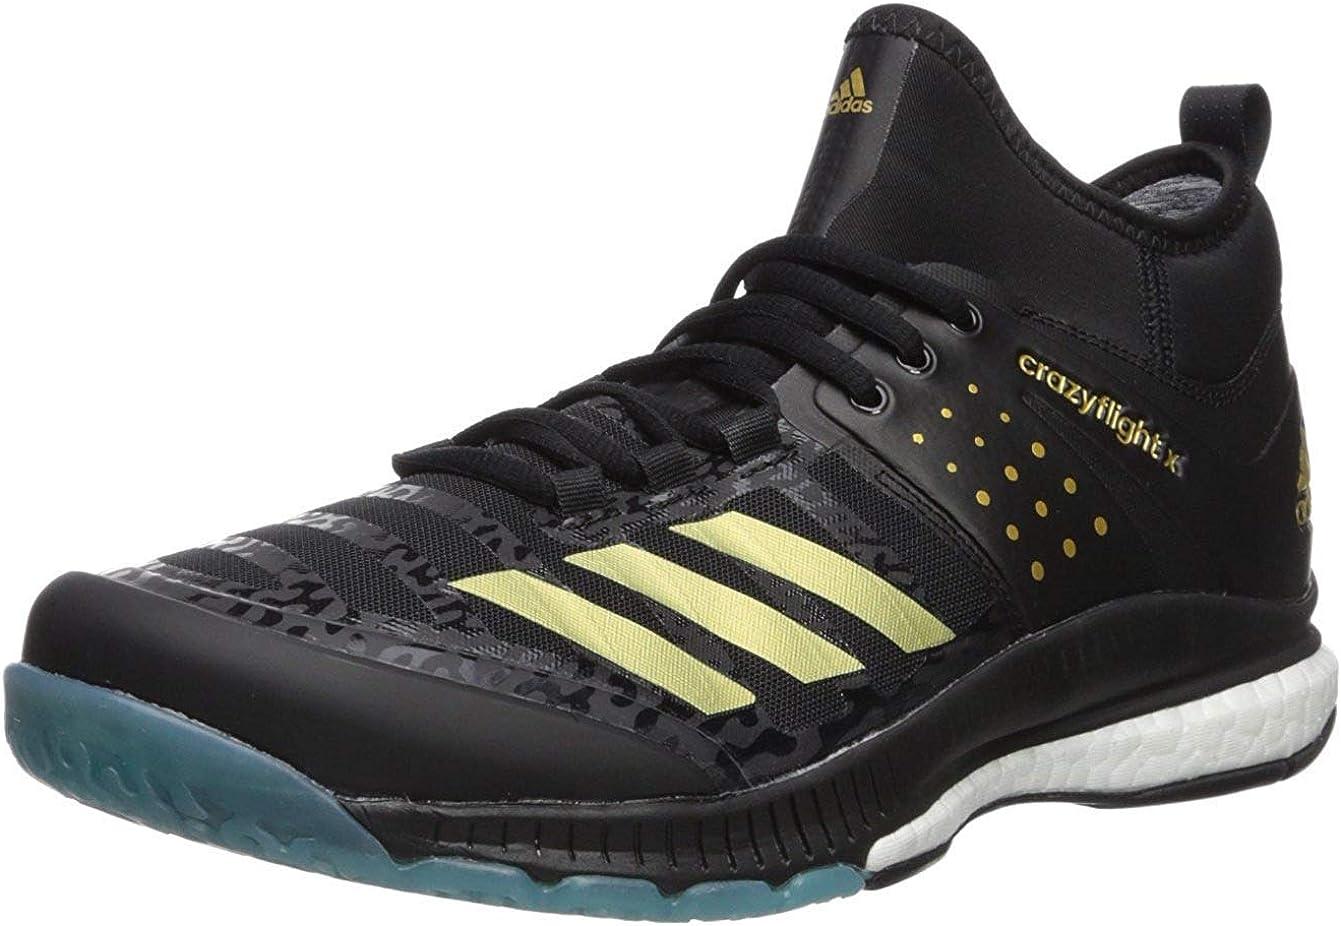 adidas Men's Crazyflight X Mid Volleyball Shoe